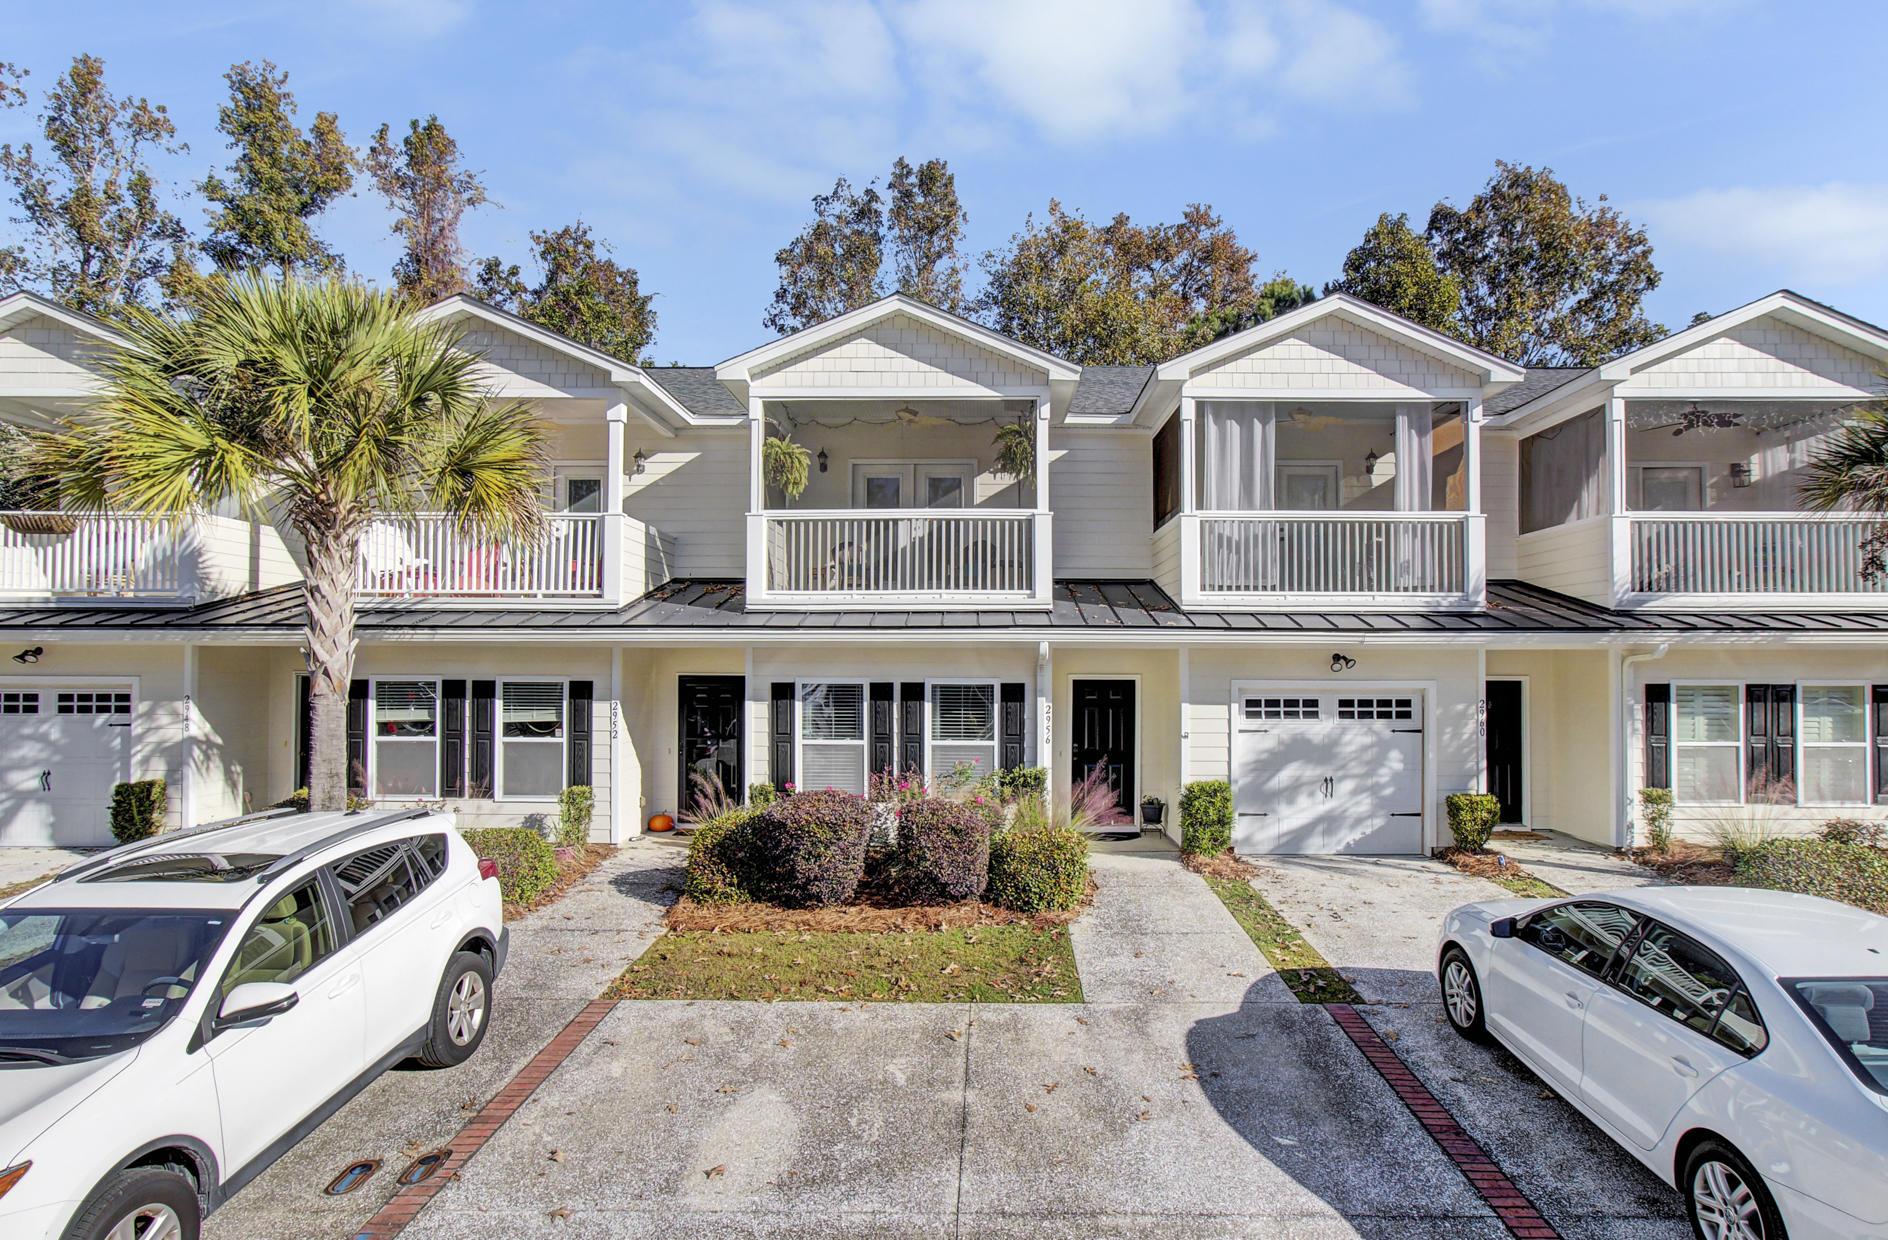 Carol Oaks Town Homes Homes For Sale - 2956 Emma, Mount Pleasant, SC - 11